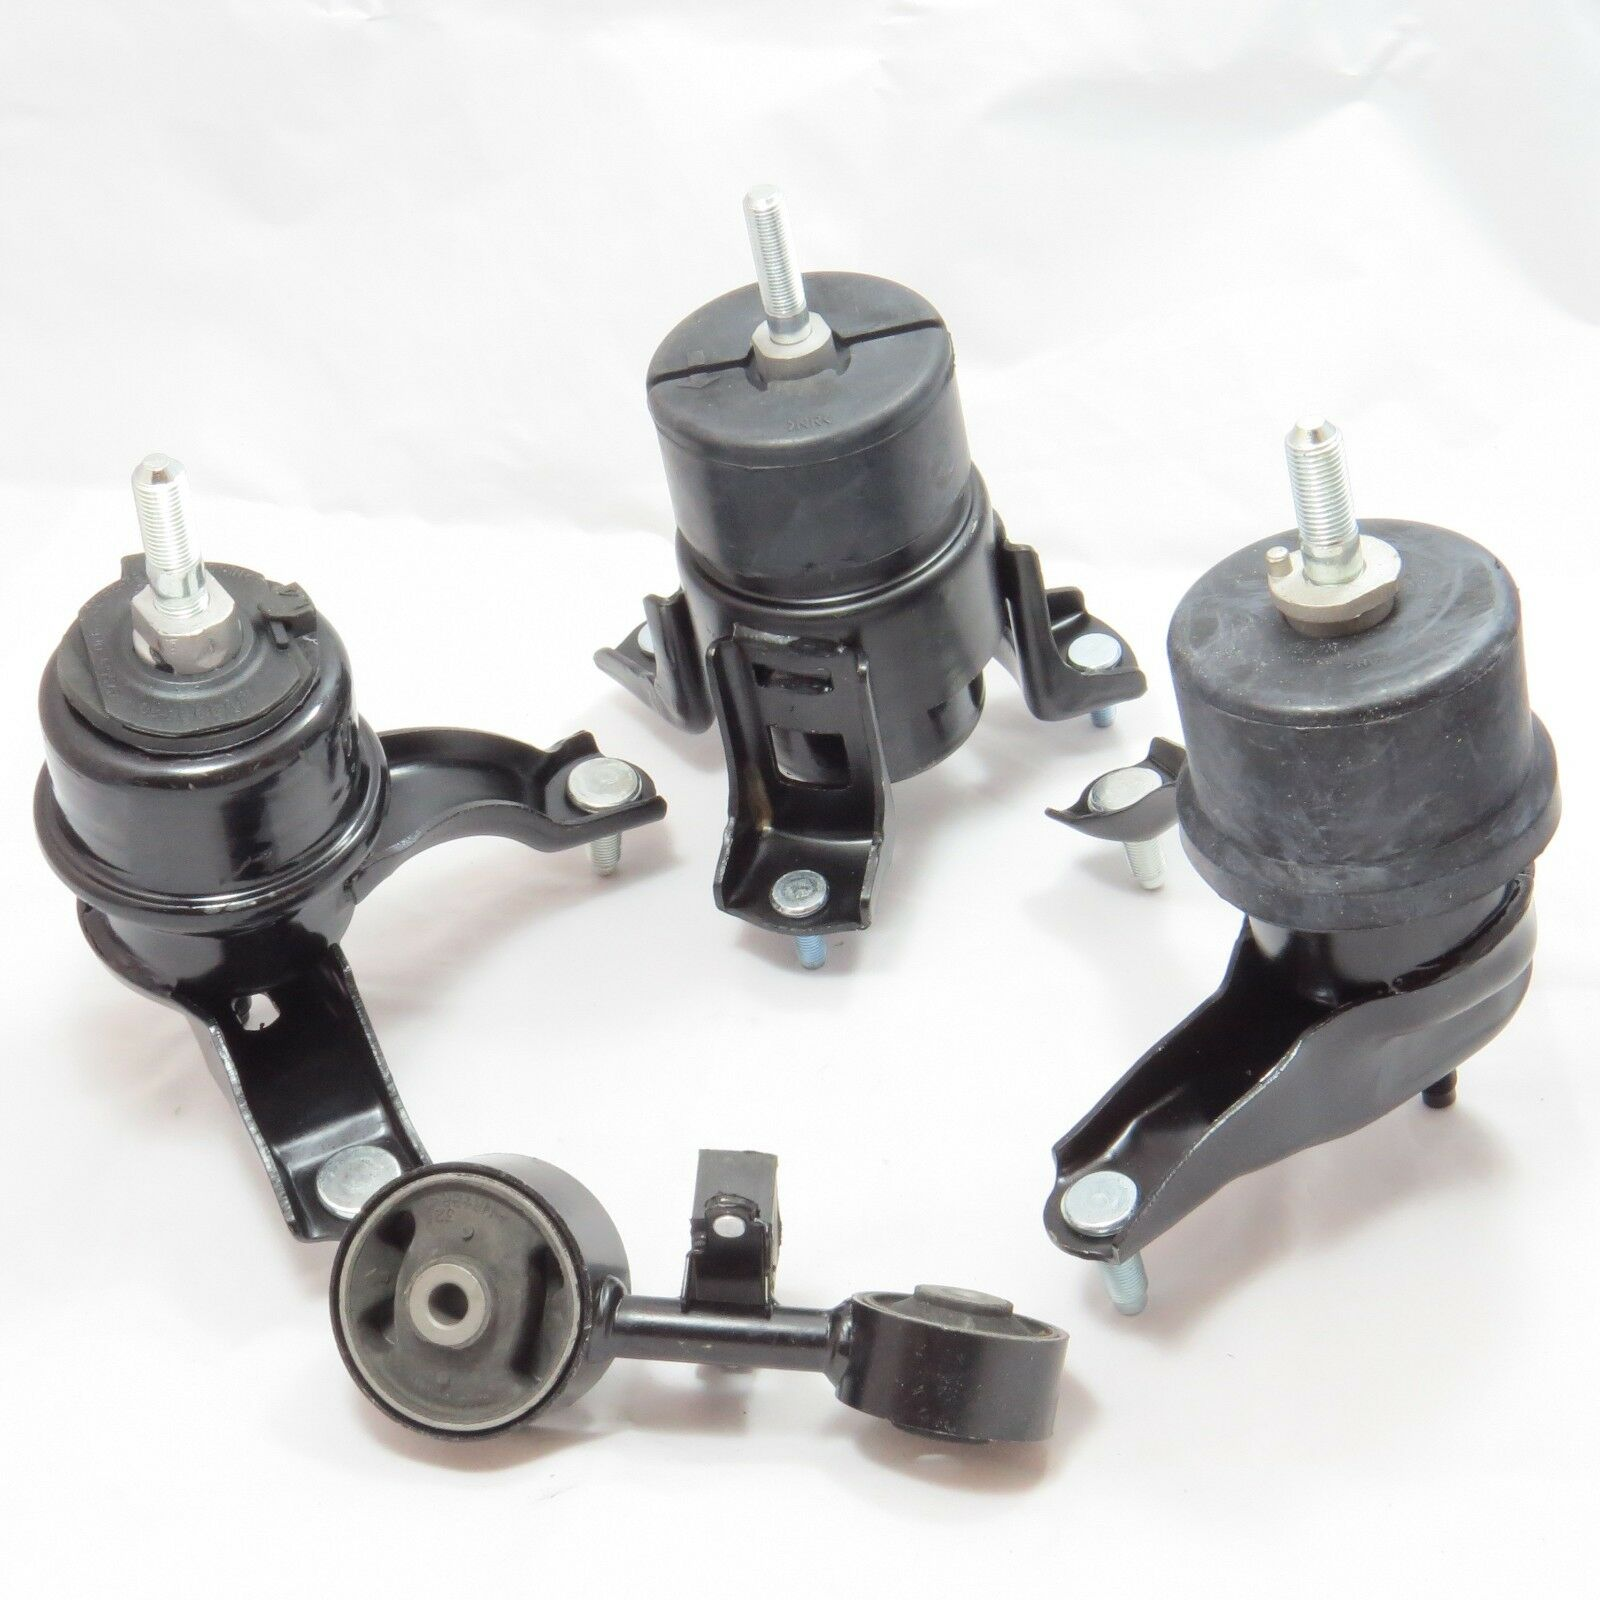 Mount Complete Set 4PCS For 2010-2011 TOYOTA CAMRY L4 2.5L Engine Motor /& Trans